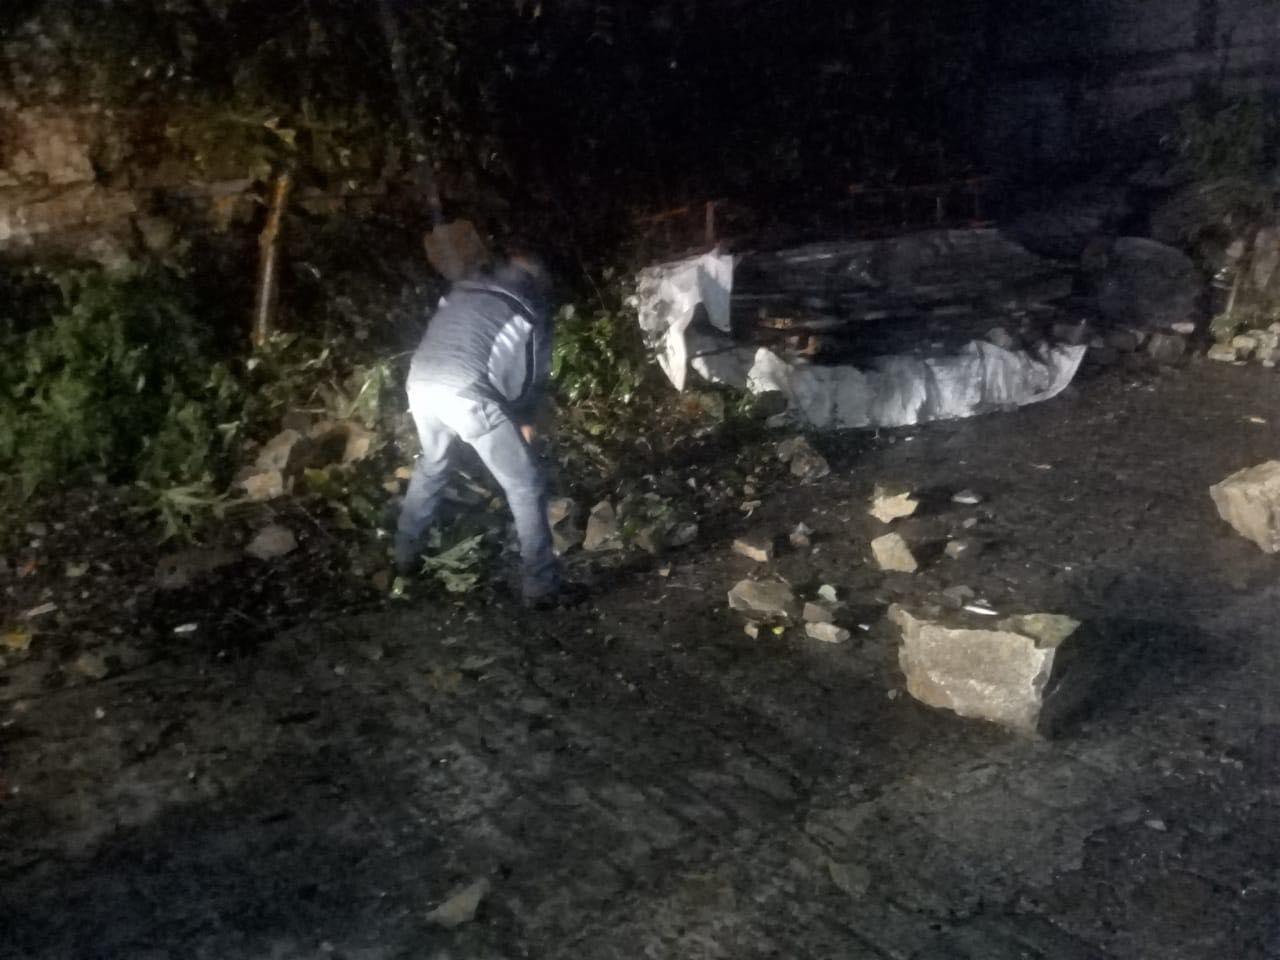 Lluvias afectan la colonia El Tabacal en Xicotepec